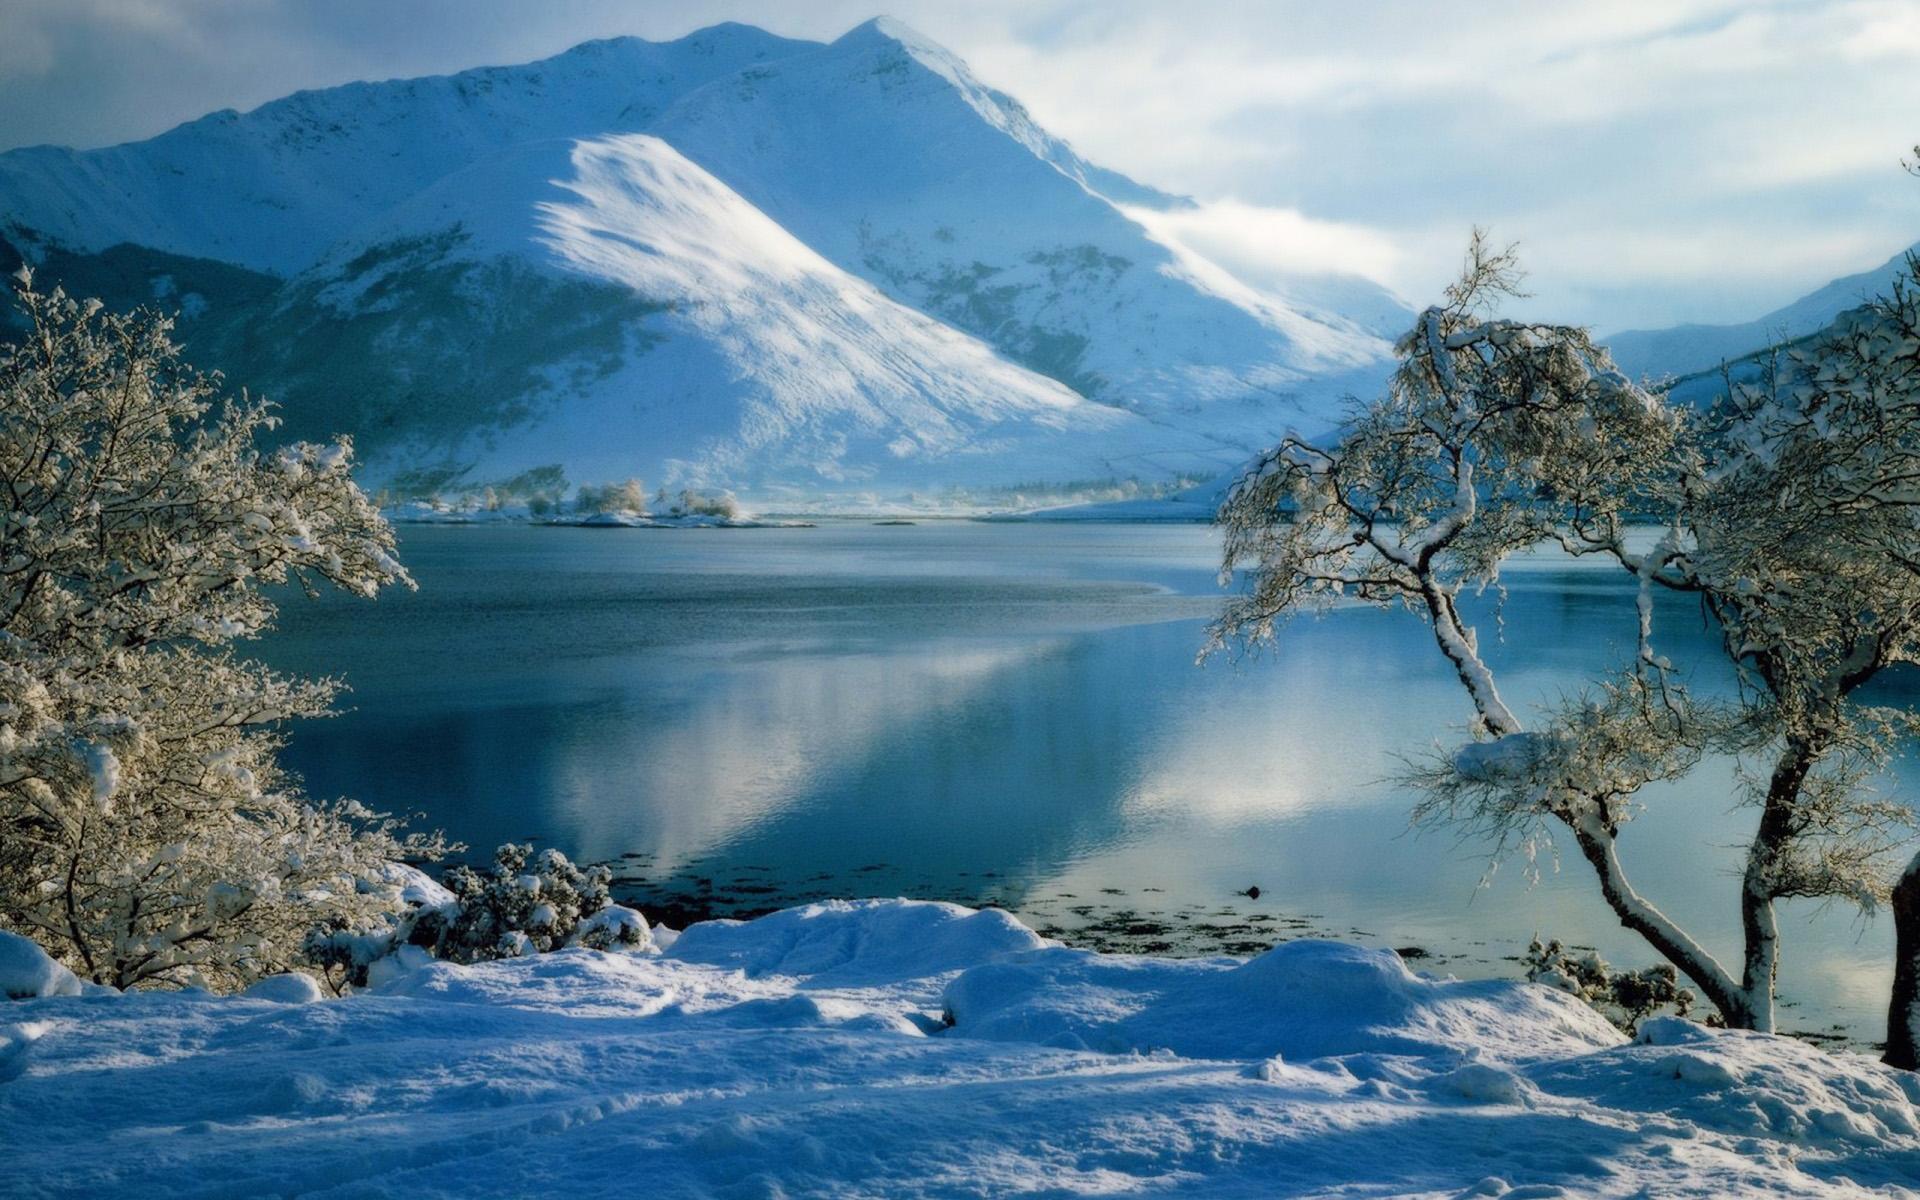 Dreamy Winter Scenes 1920x1200 Wallpapers 1920x1200 Wallpapers 1920x1200